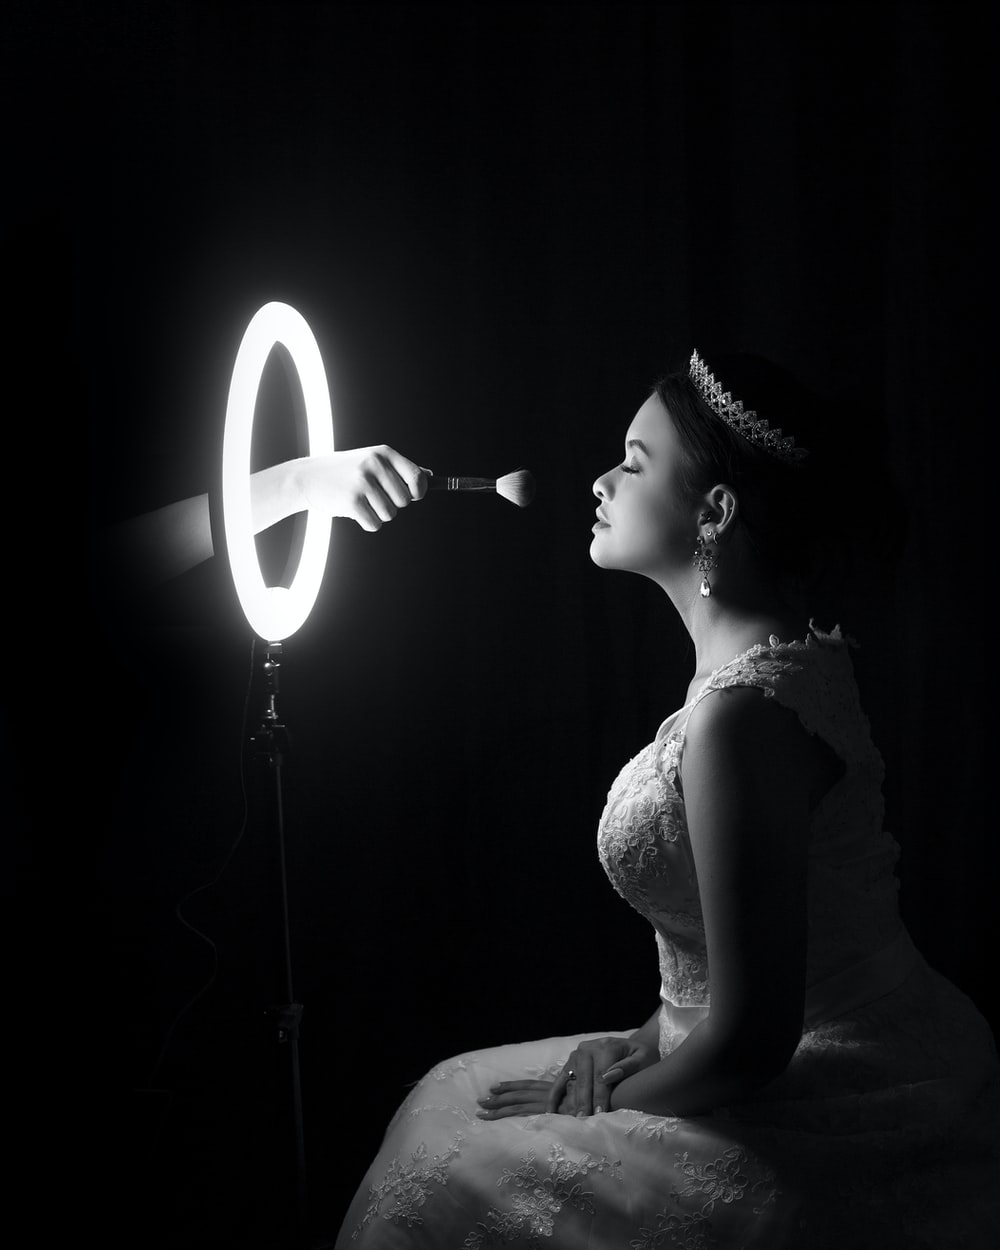 woman in white dress holding white light